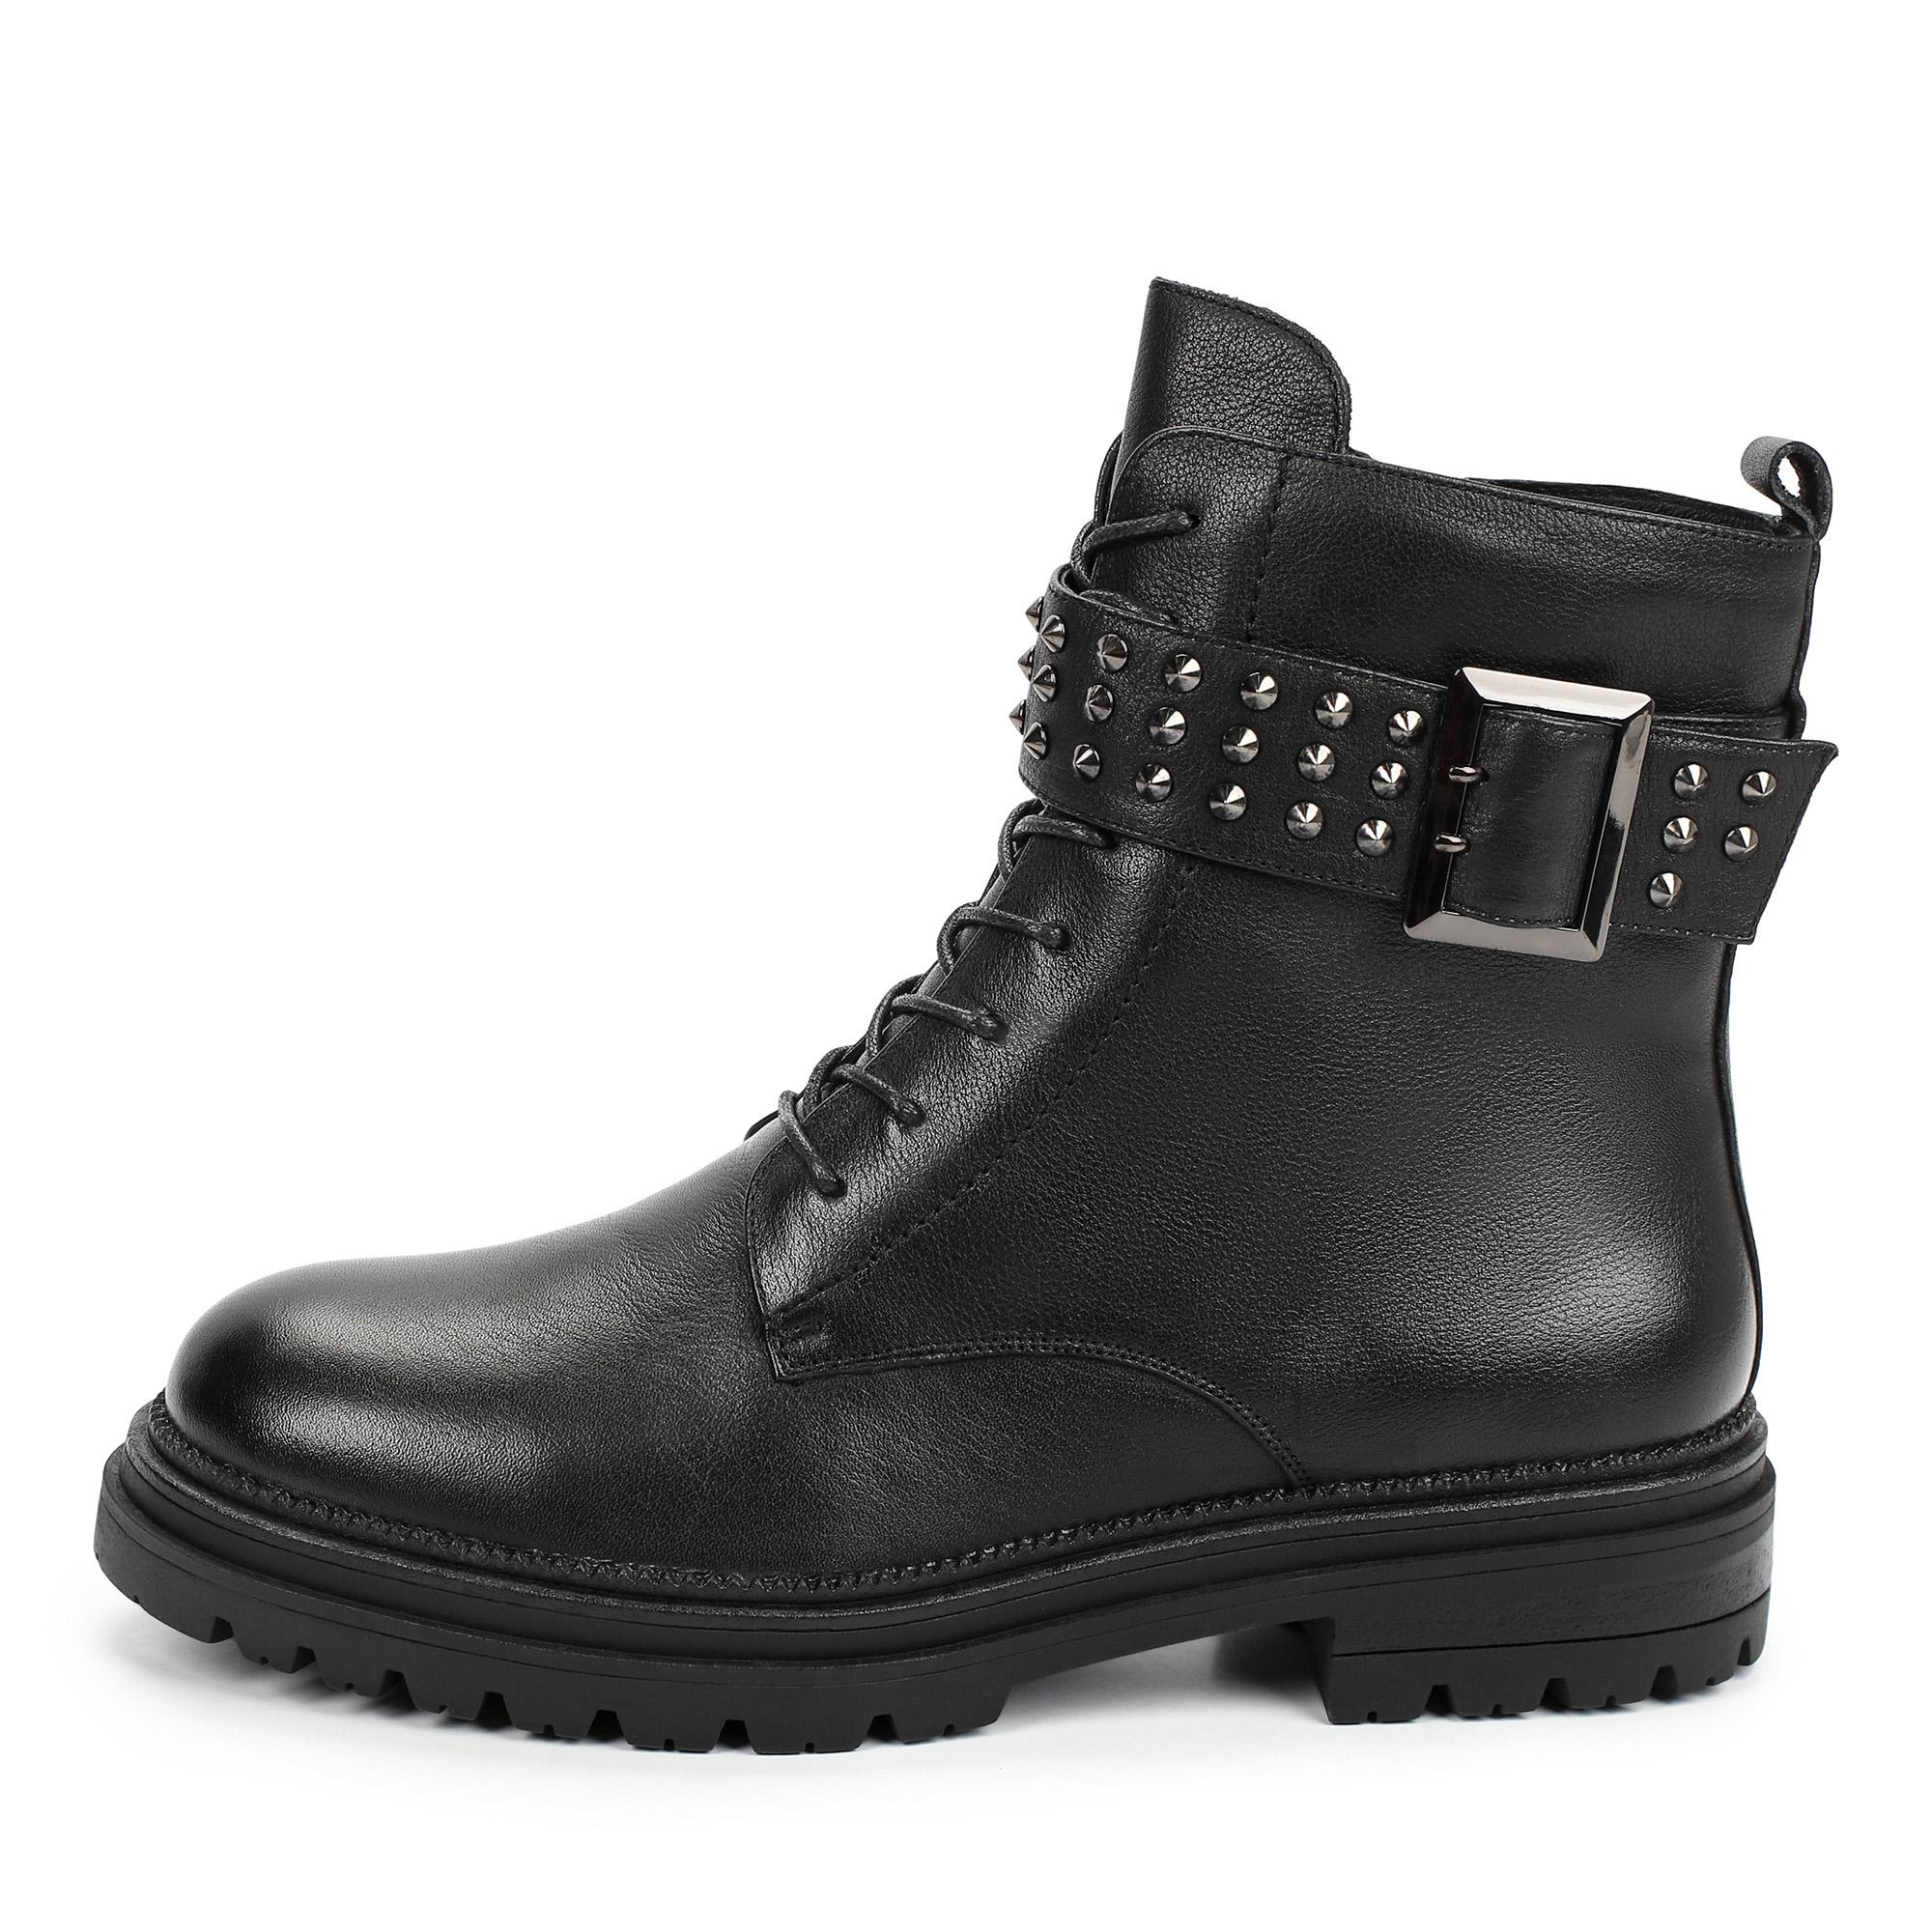 Ботинки Thomas Munz 058-517A-2102